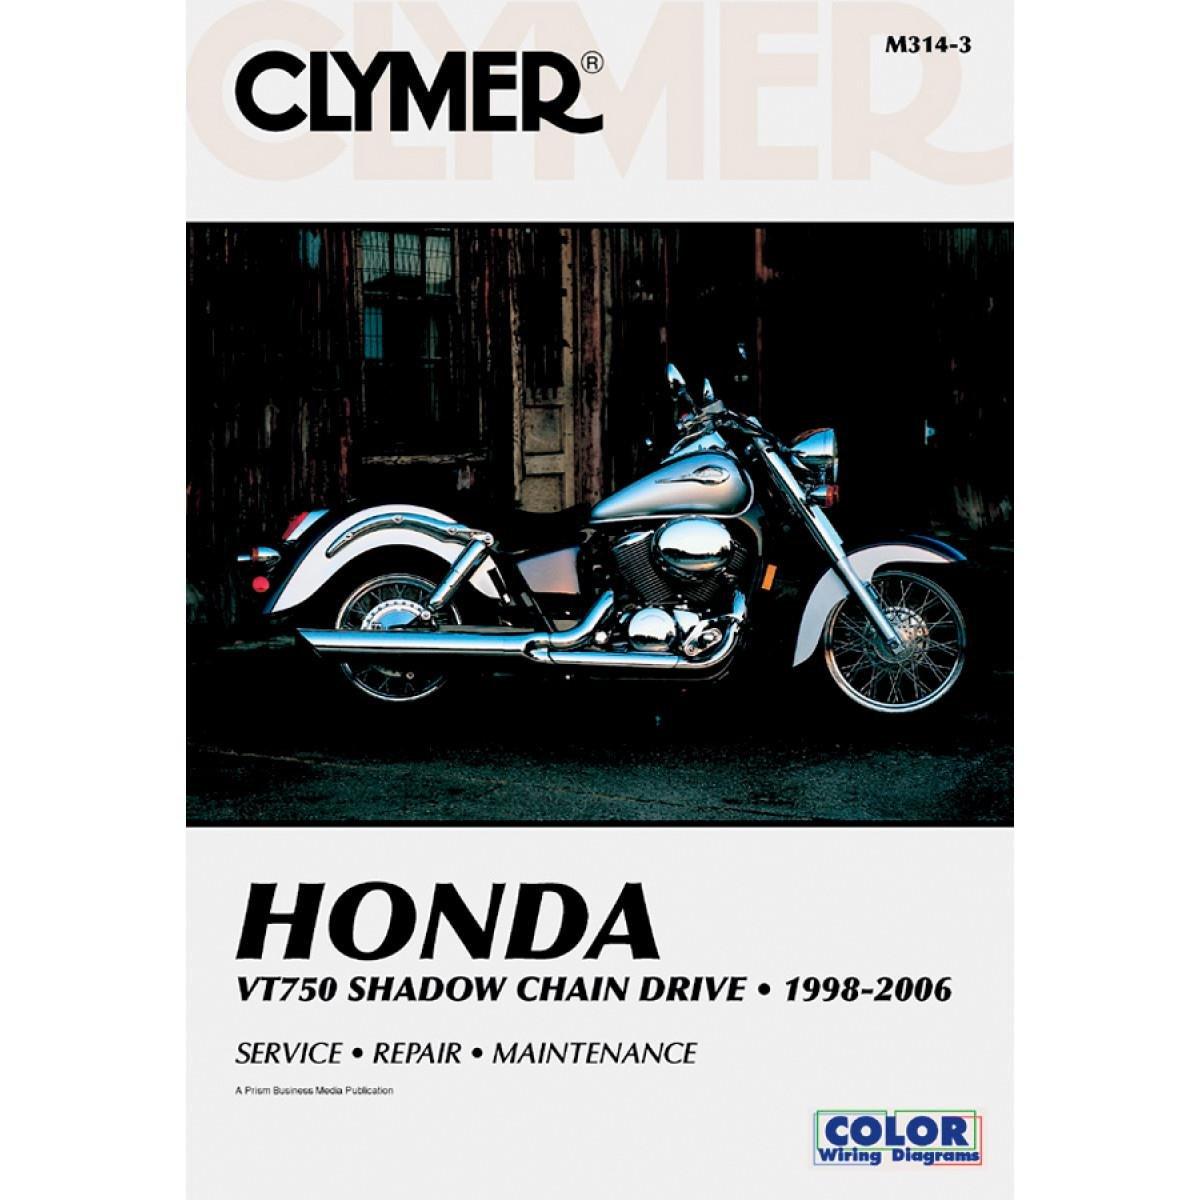 01-06 HONDA VT750DC Clymer Service Manual M314-3 61401679